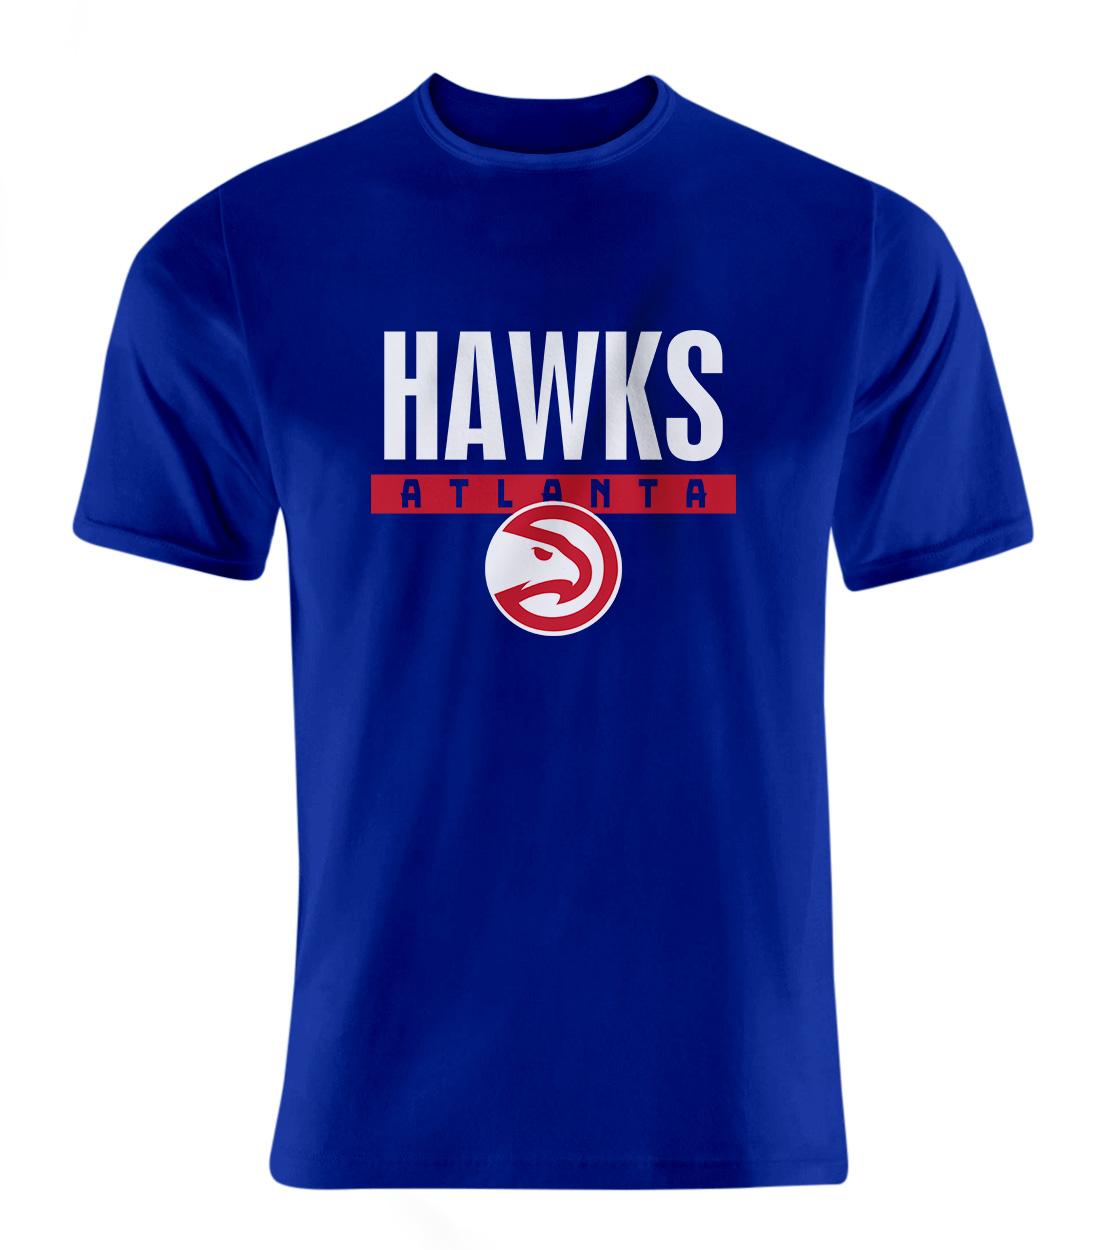 Atlanta Hawks Tshirt (TSH-BLU-NP-19-NBA-ATL-HAWKS)